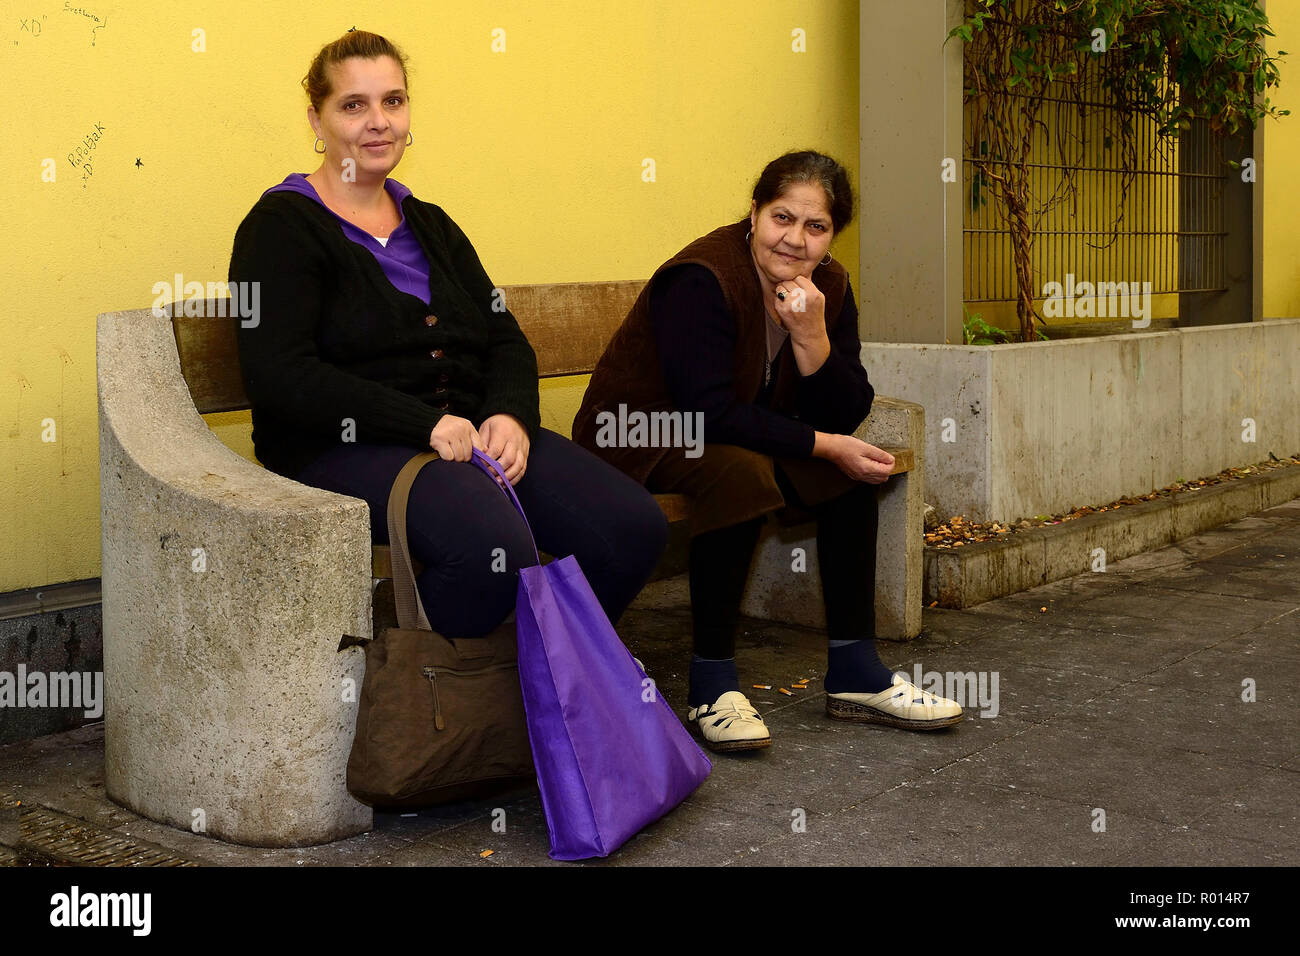 Germany, North Rhine-Westphalia - Refugees in NRW - Stock Image